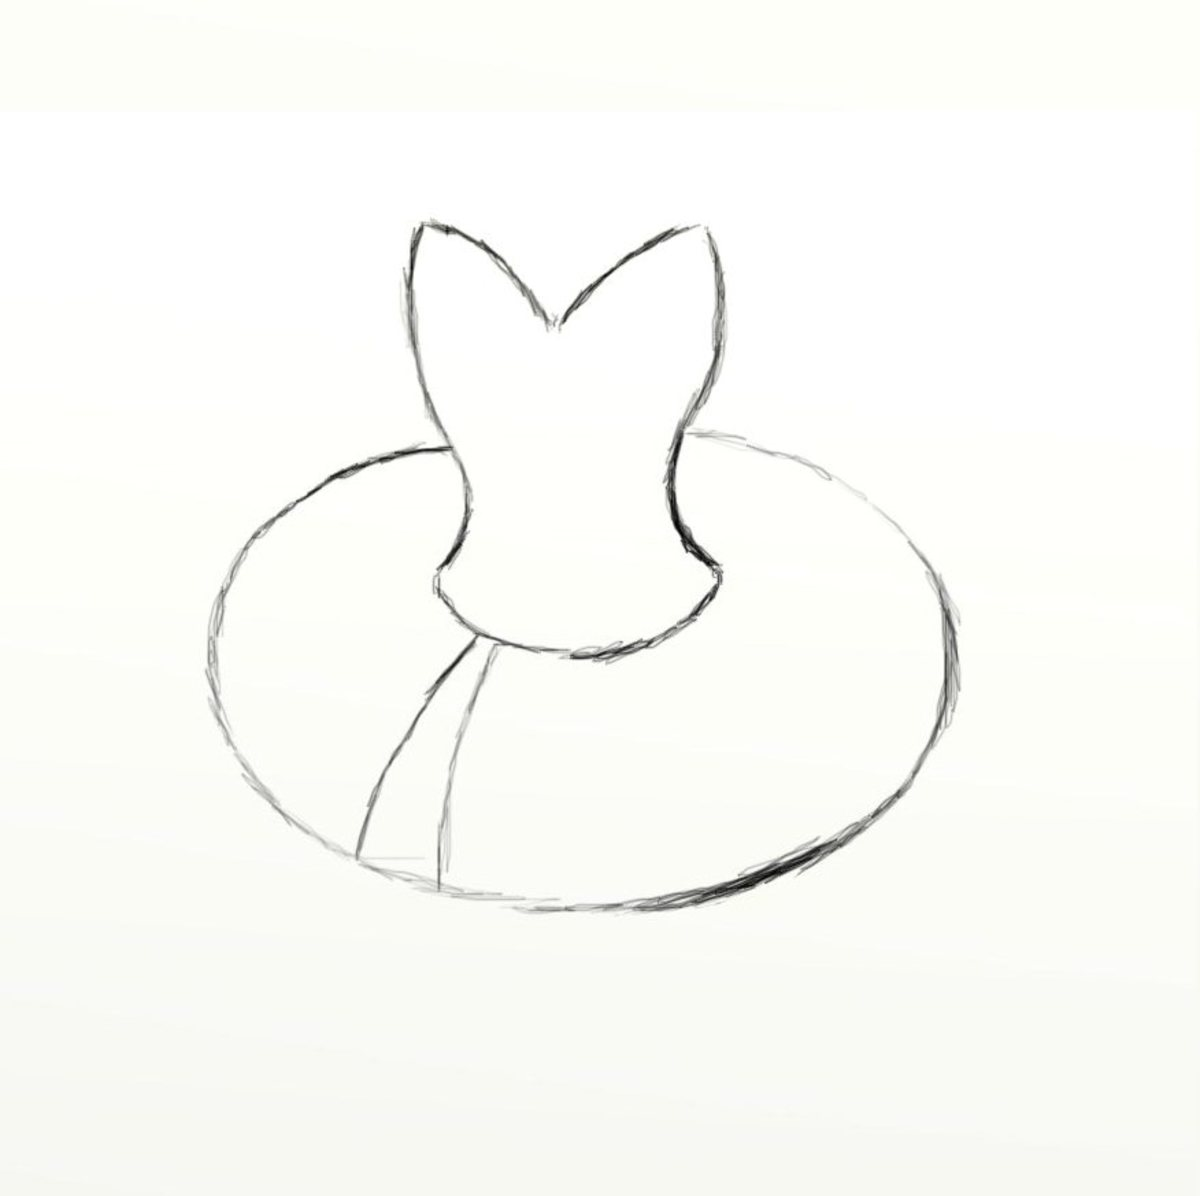 How to Draw a Tutu | FeltMagnet